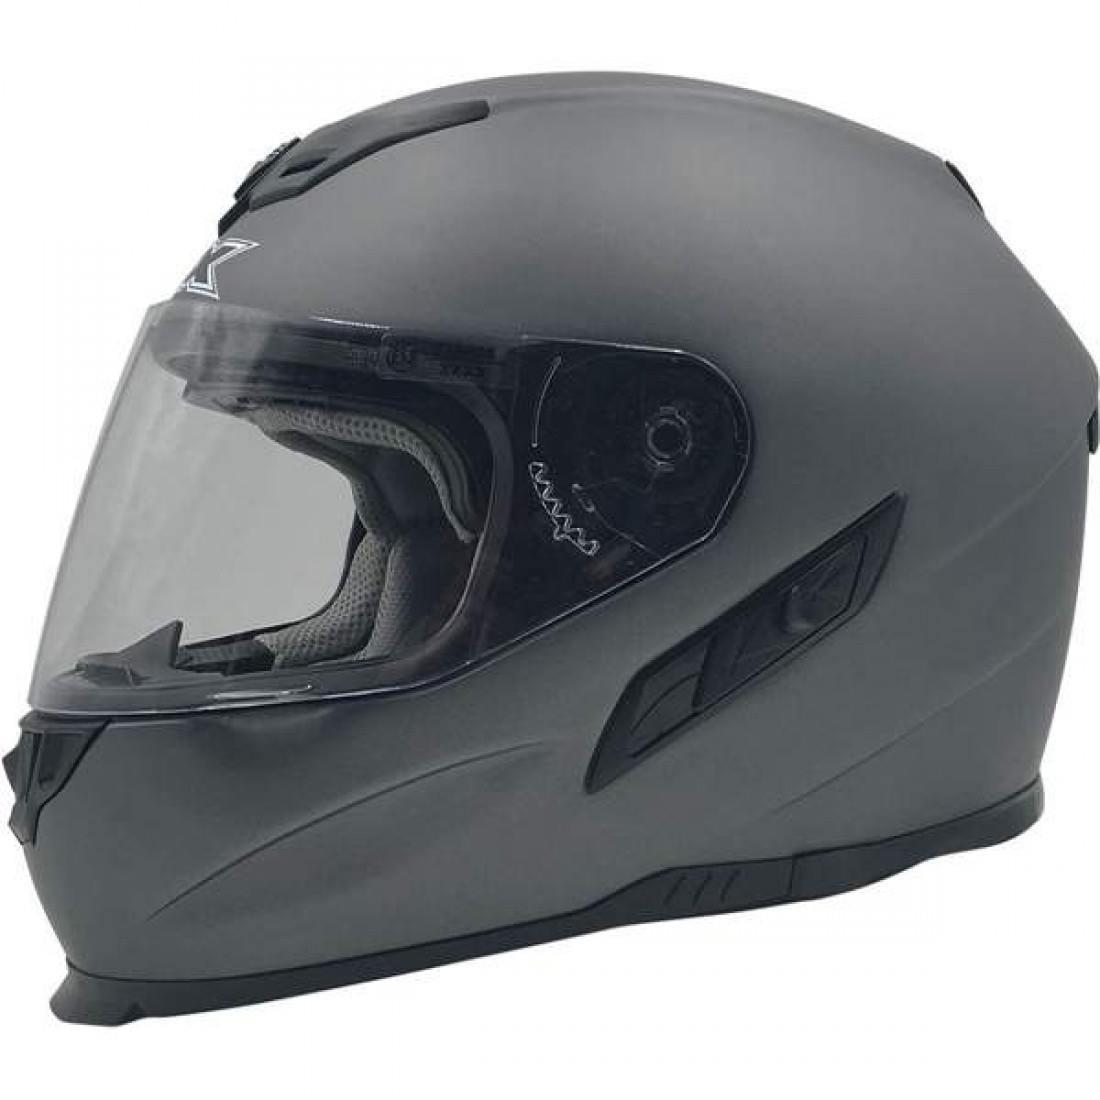 AFX Helmets FX-105 Helmets - MX South